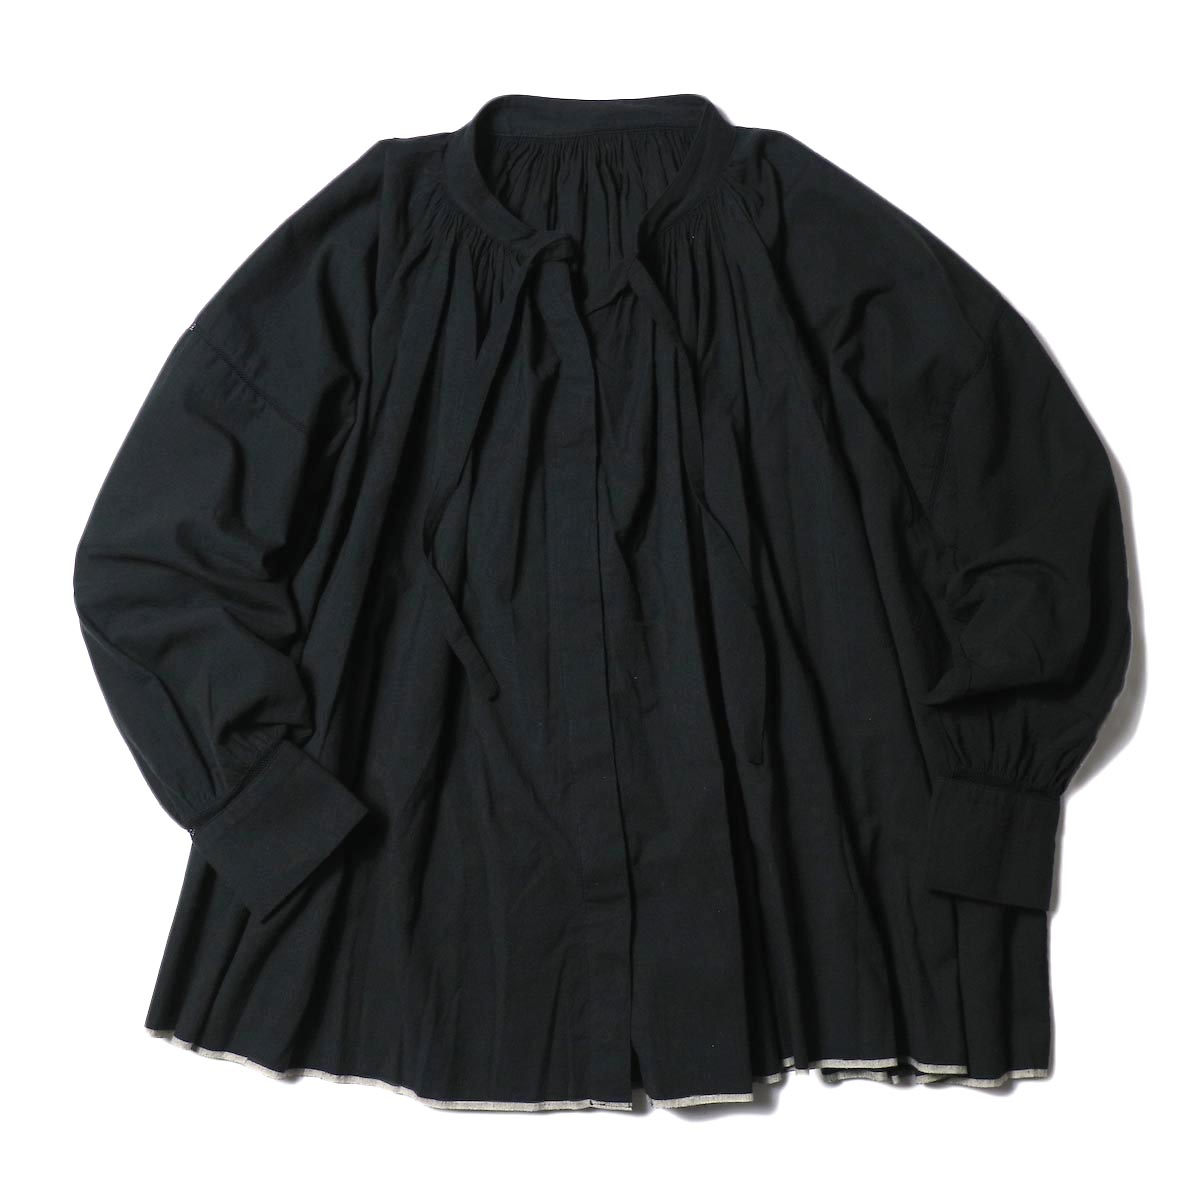 maison de soil / NECK GATHERED SHIRTS (black)